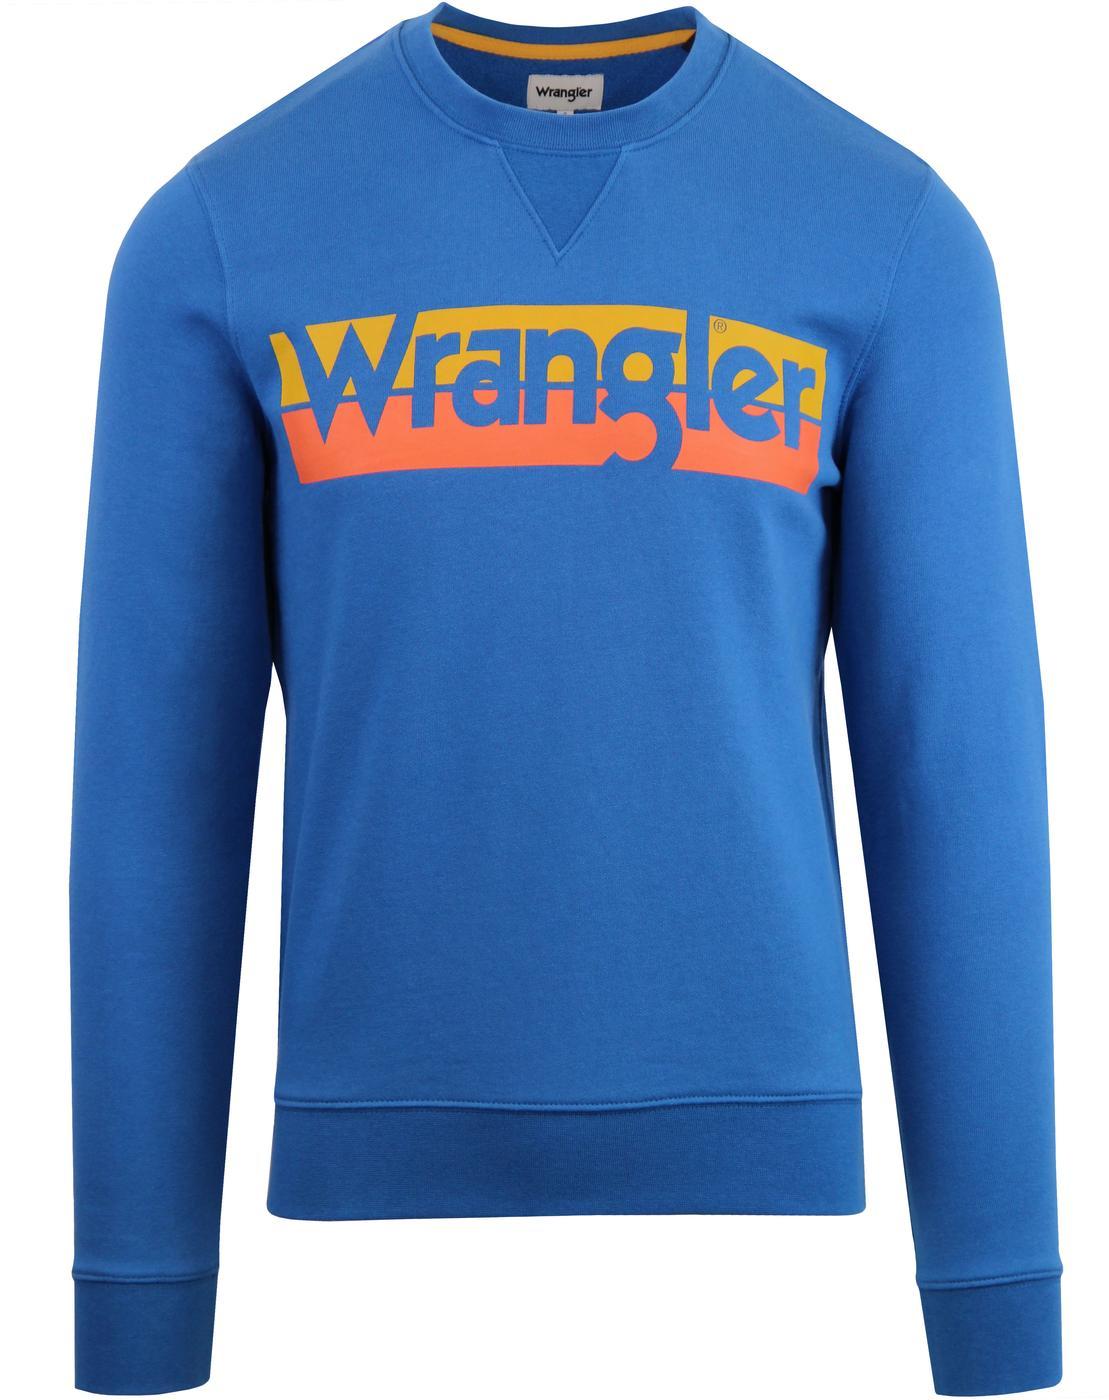 WRANGLER Retro 70's Block Logo Sweatshirt DW